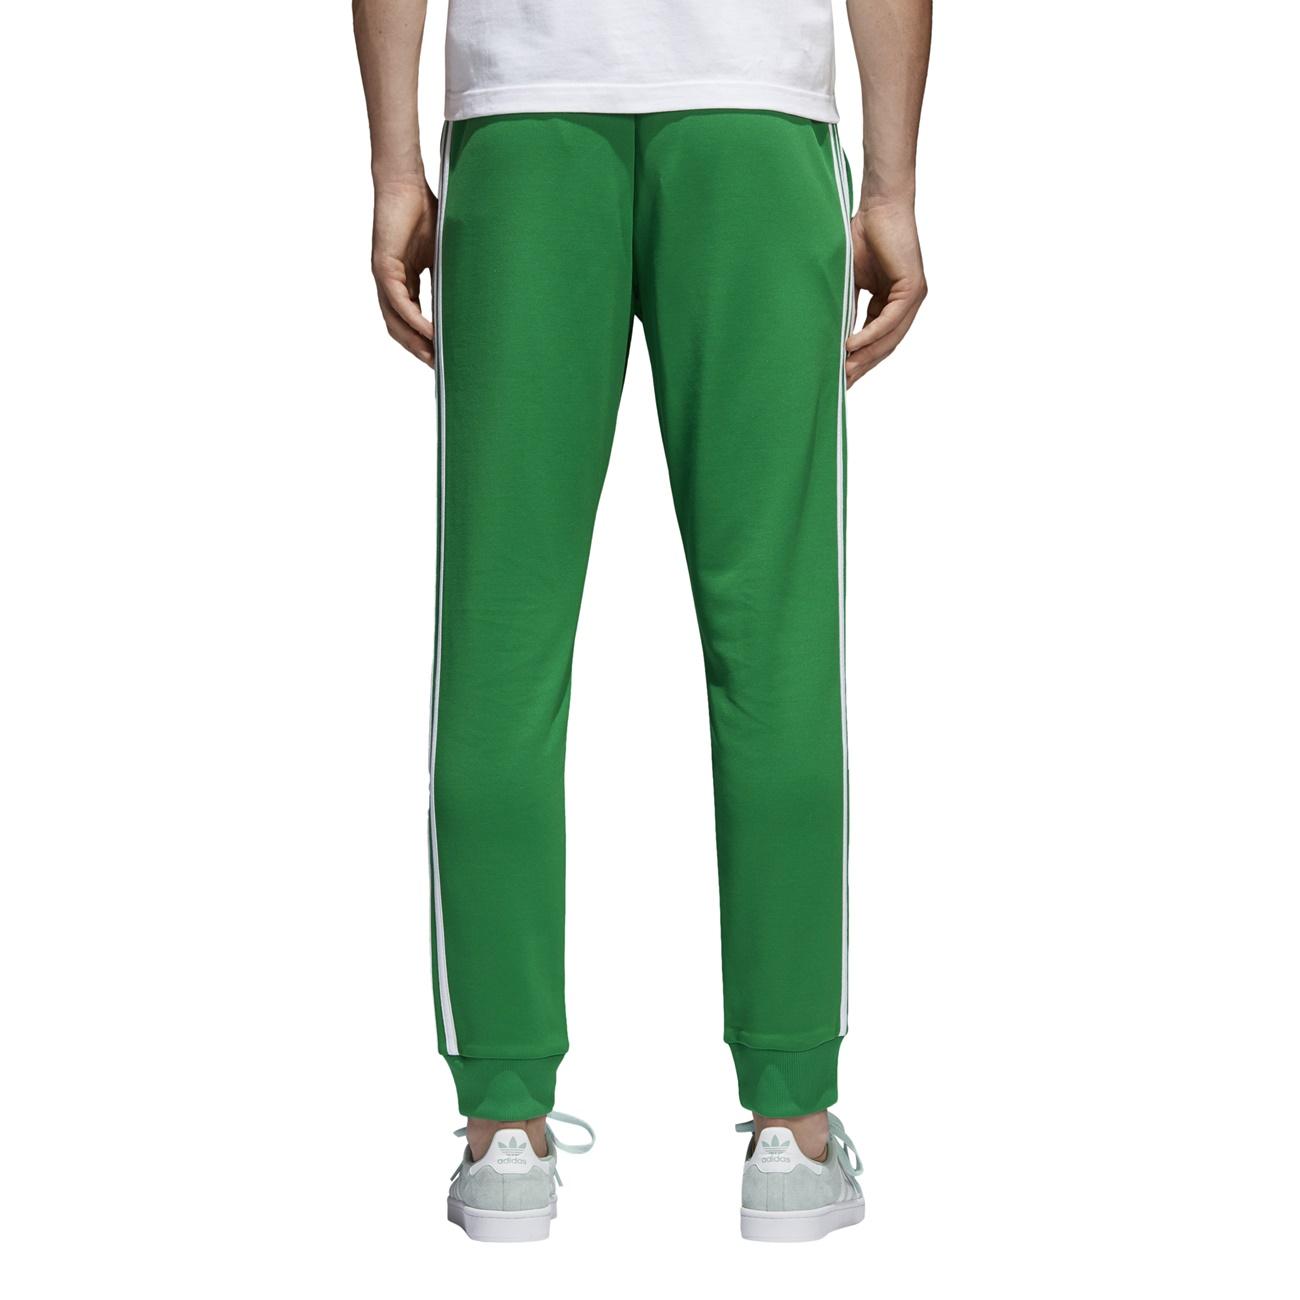 premium selection aa9d5 b7bbb adidas-originals-superstar-track-pants-green-11.jpg